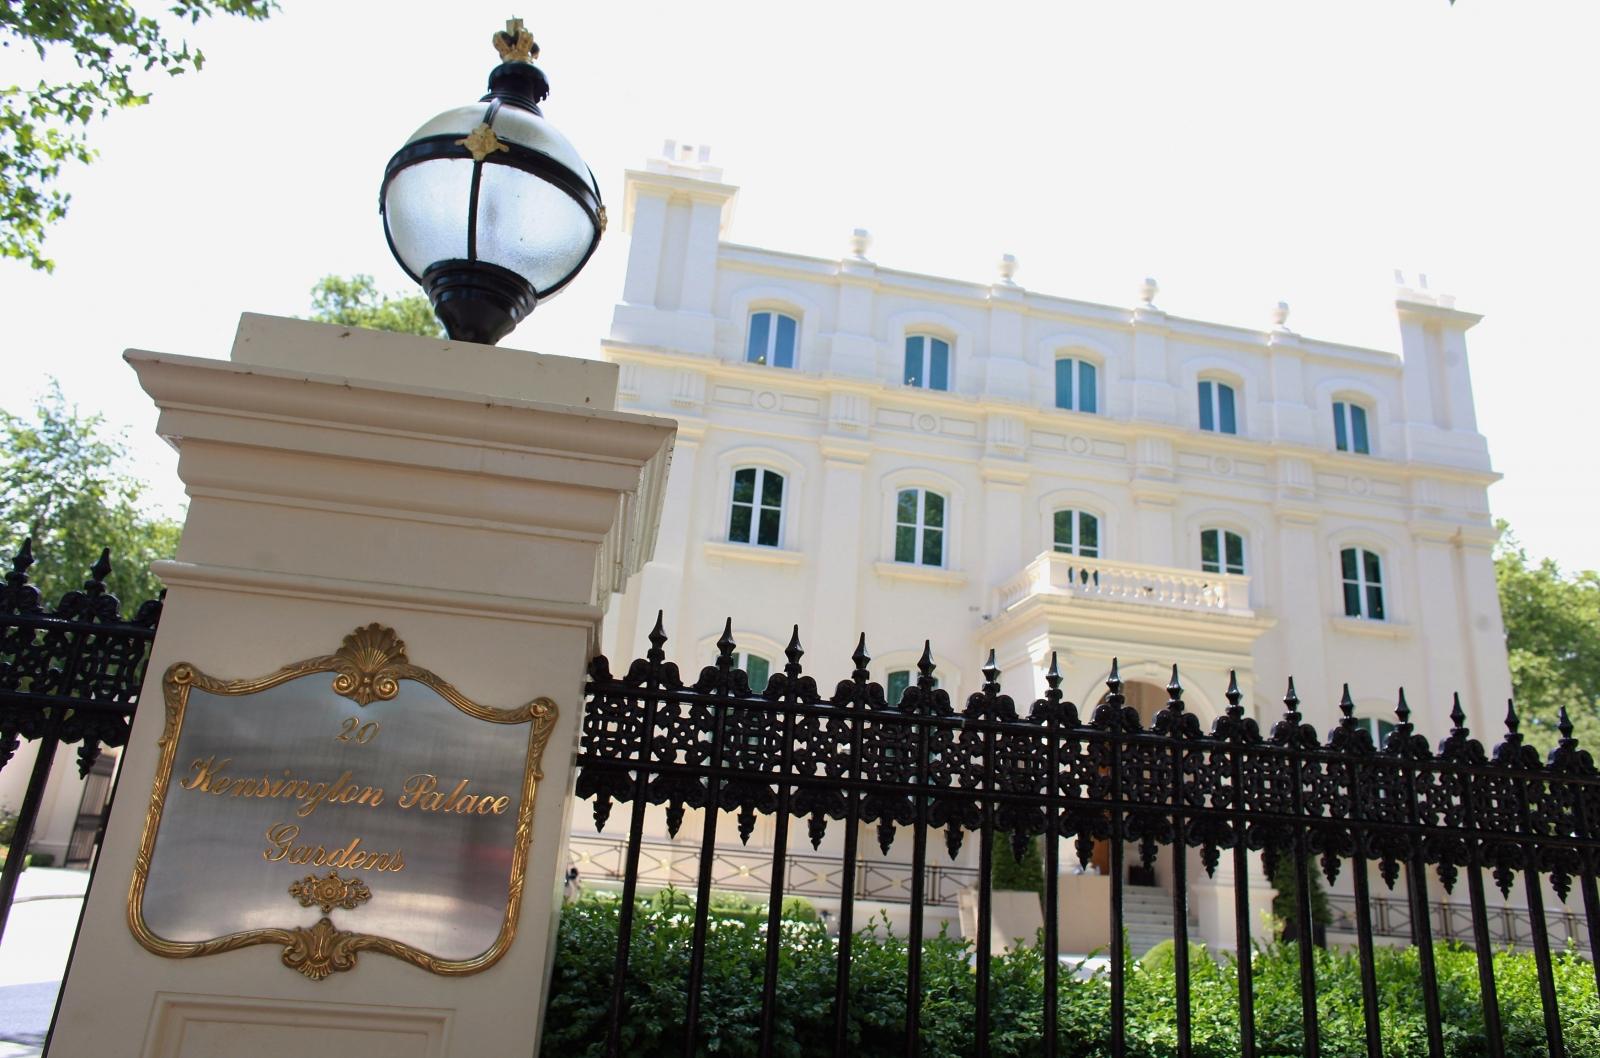 Kensington Palace Gardens property house prices